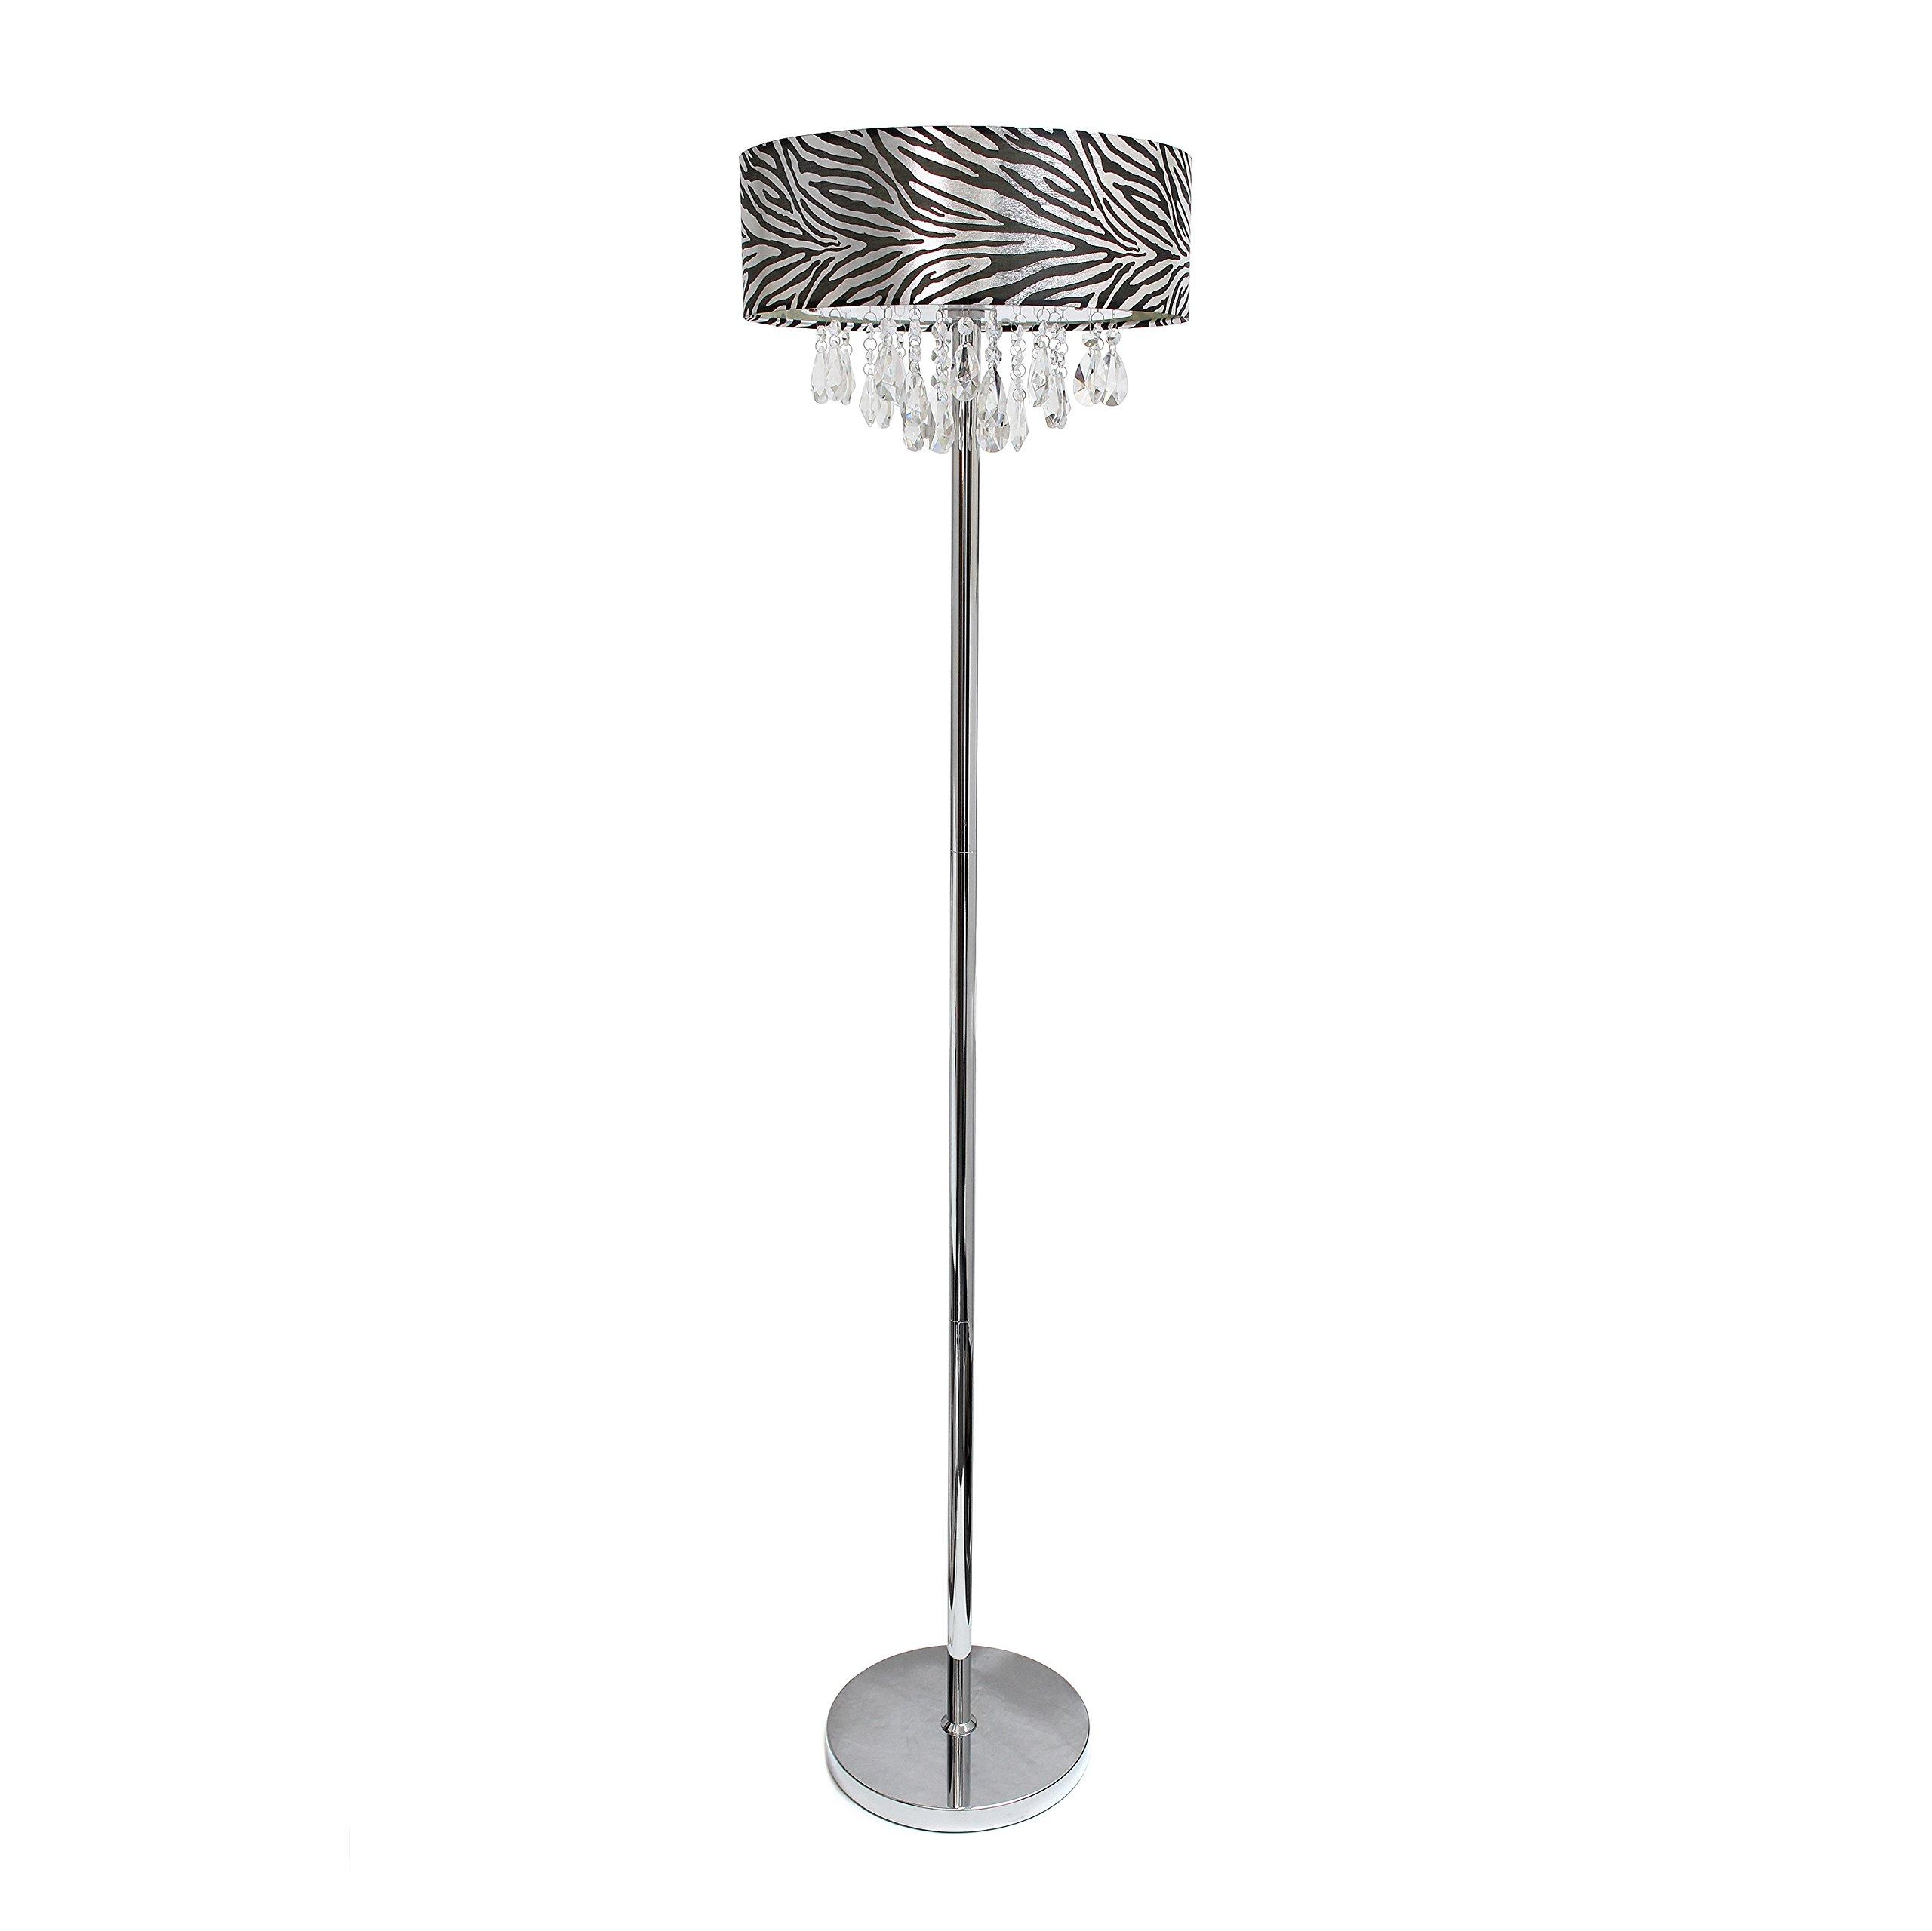 Elegant Designs LF1000-ZBA Romazzino Collection Crystal and Chrome Floor Lamp, Metallic Zebra Print